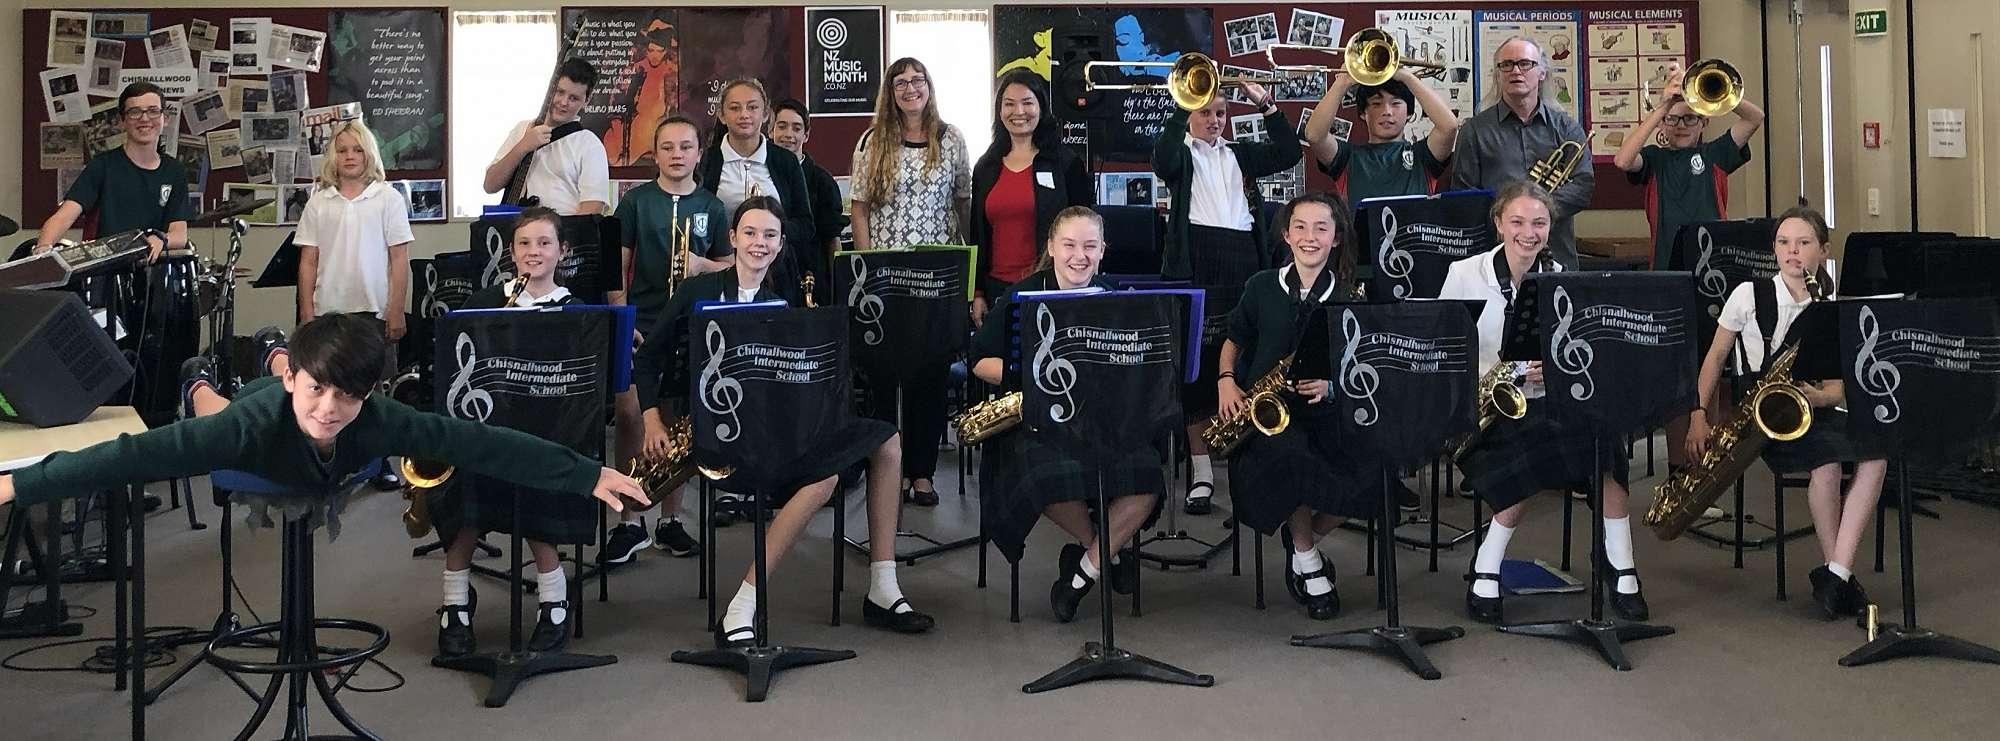 Visitors to Chisnallwood music - Chisnallwood Music News